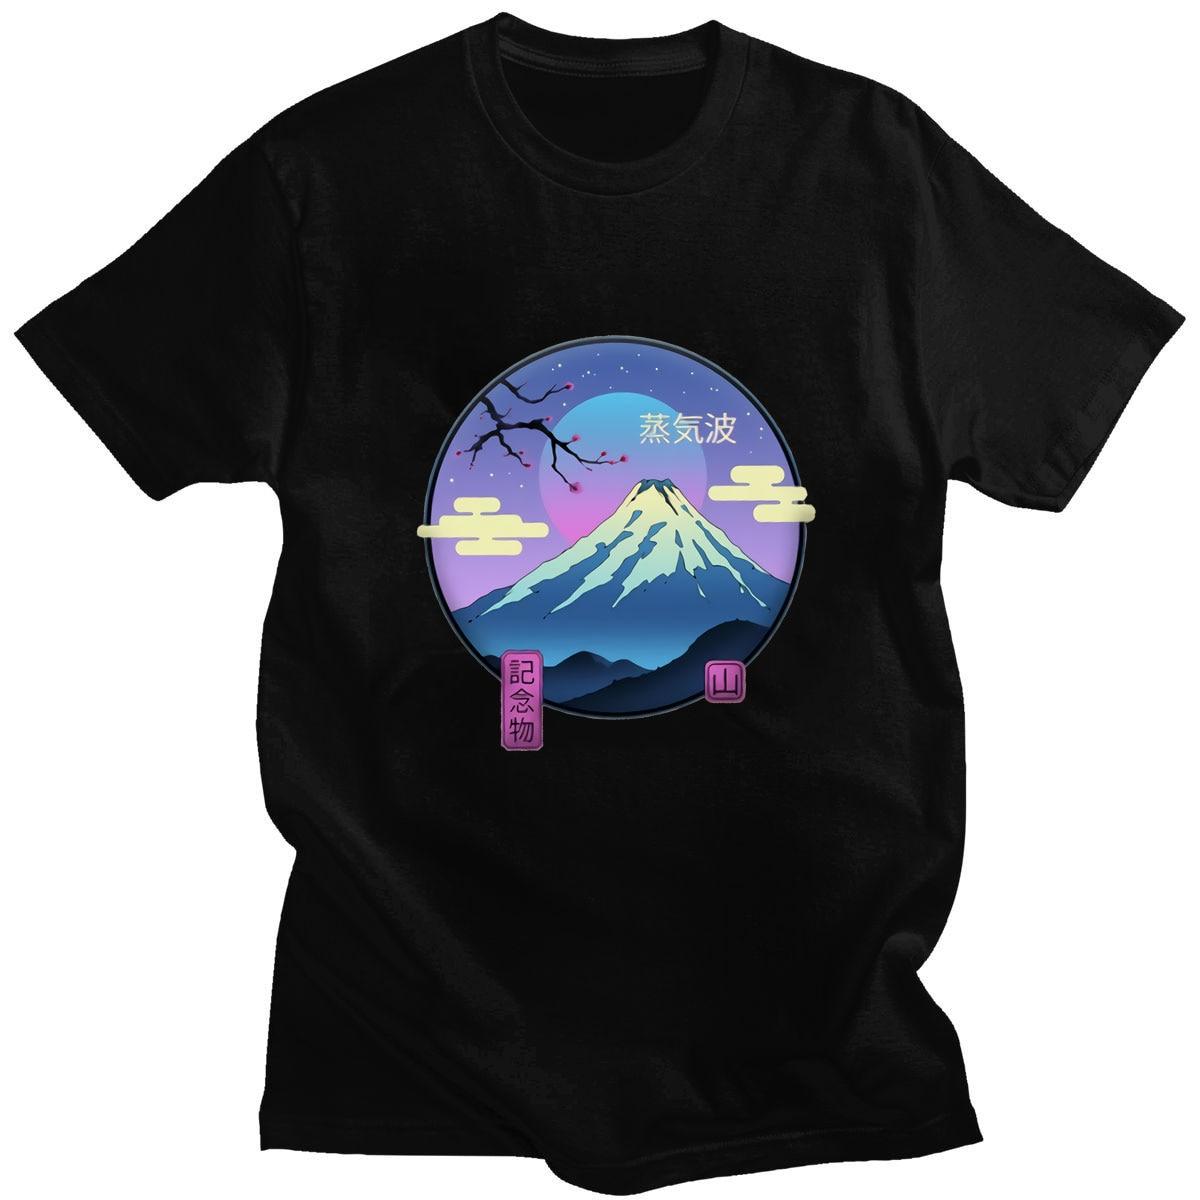 Hot Sale Mount Fuji Pattern T-shirt Japan Landscape Mans Clothing Harajuku T-shirts Men Fashion Punk Mens Short Sleeve T Shirts